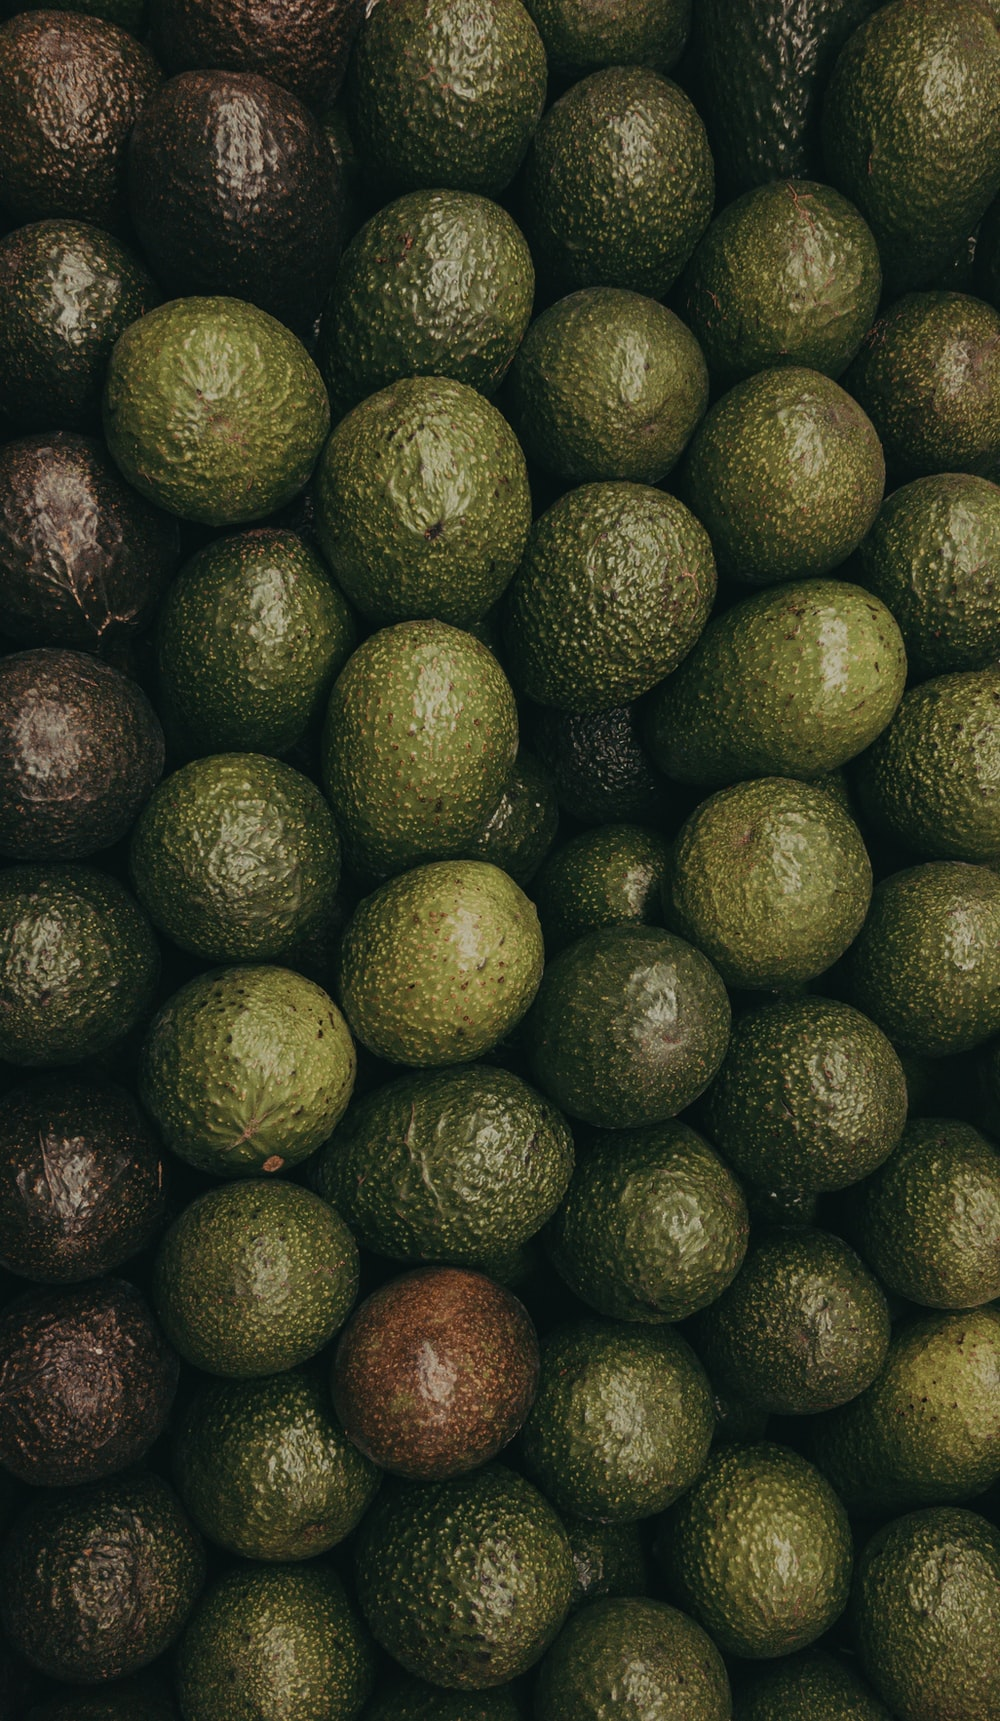 green and purple avocado fruit lot